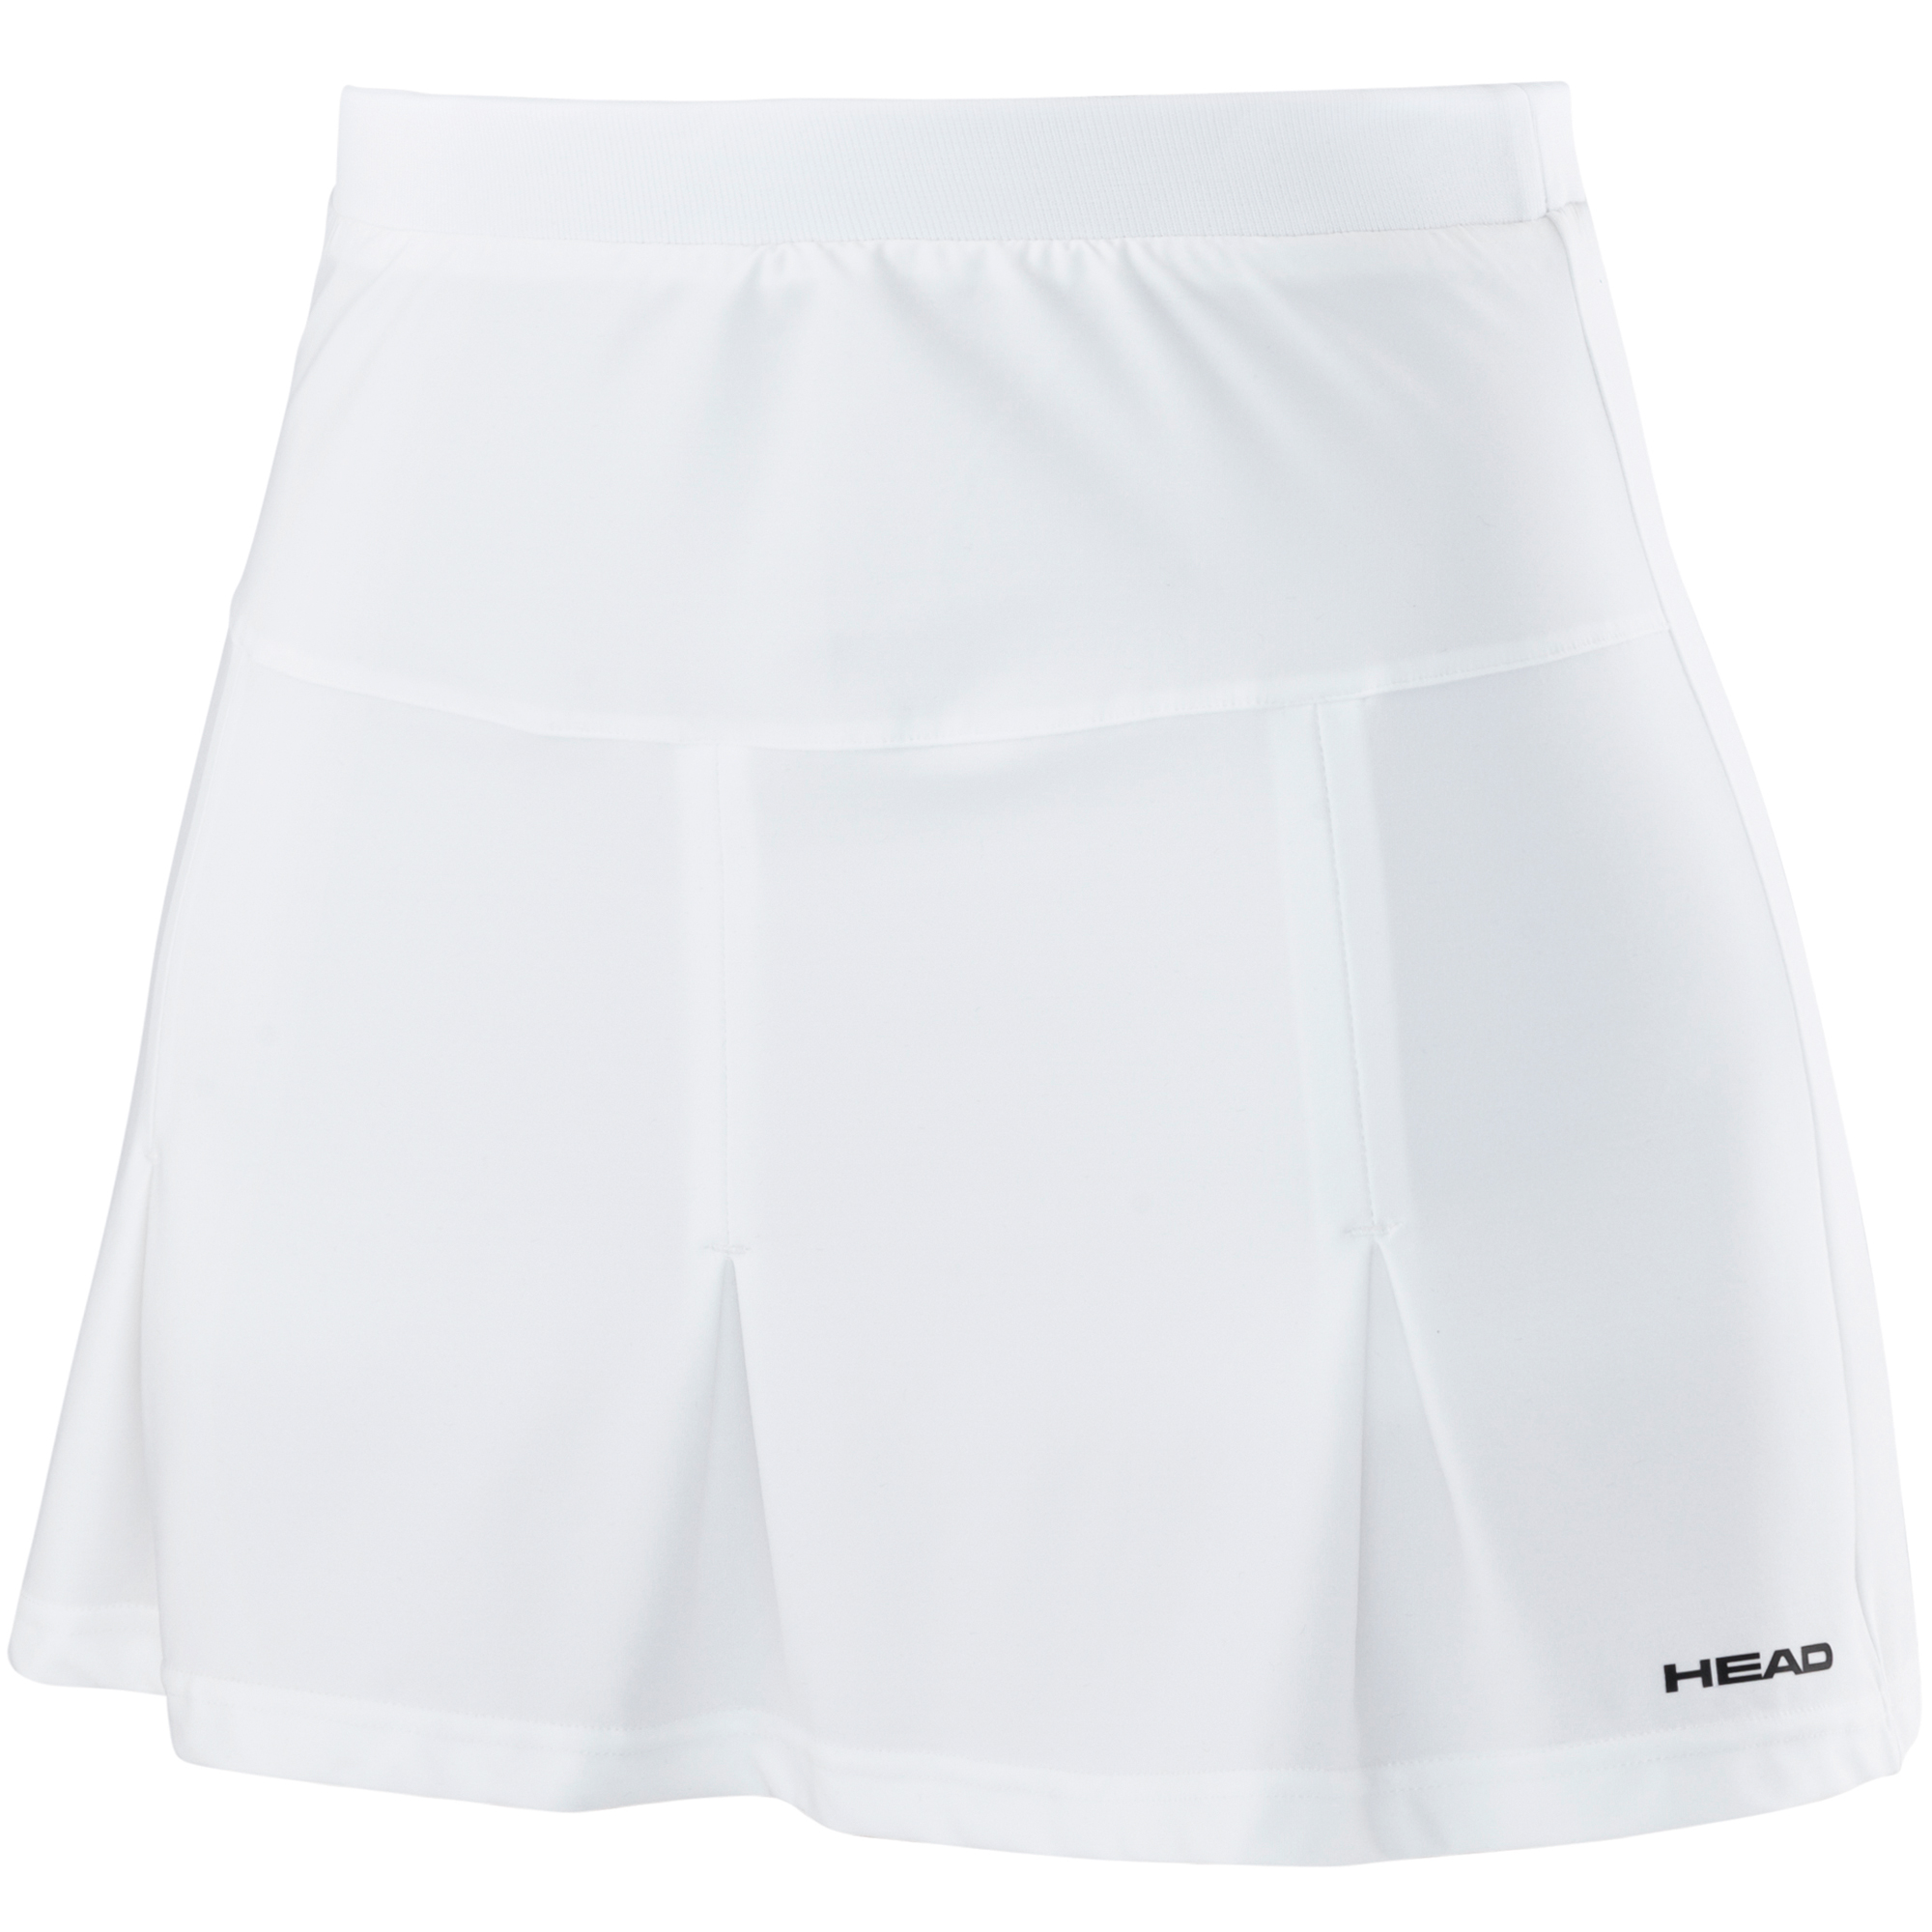 Head Club Basic Ladies Long Skort - White, XS